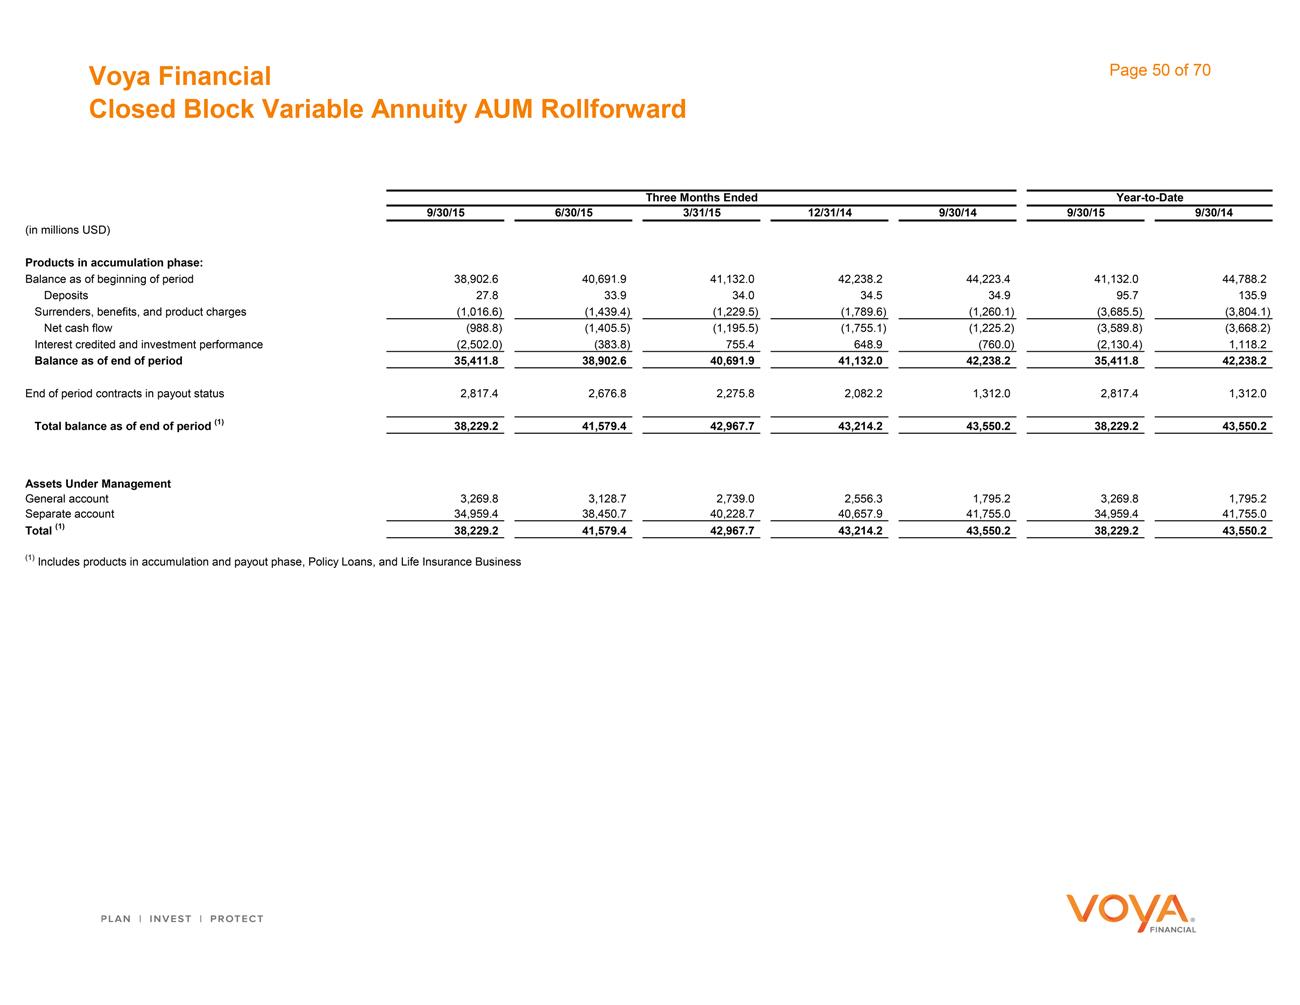 Form 8 K Voya Financial Inc For Nov 04